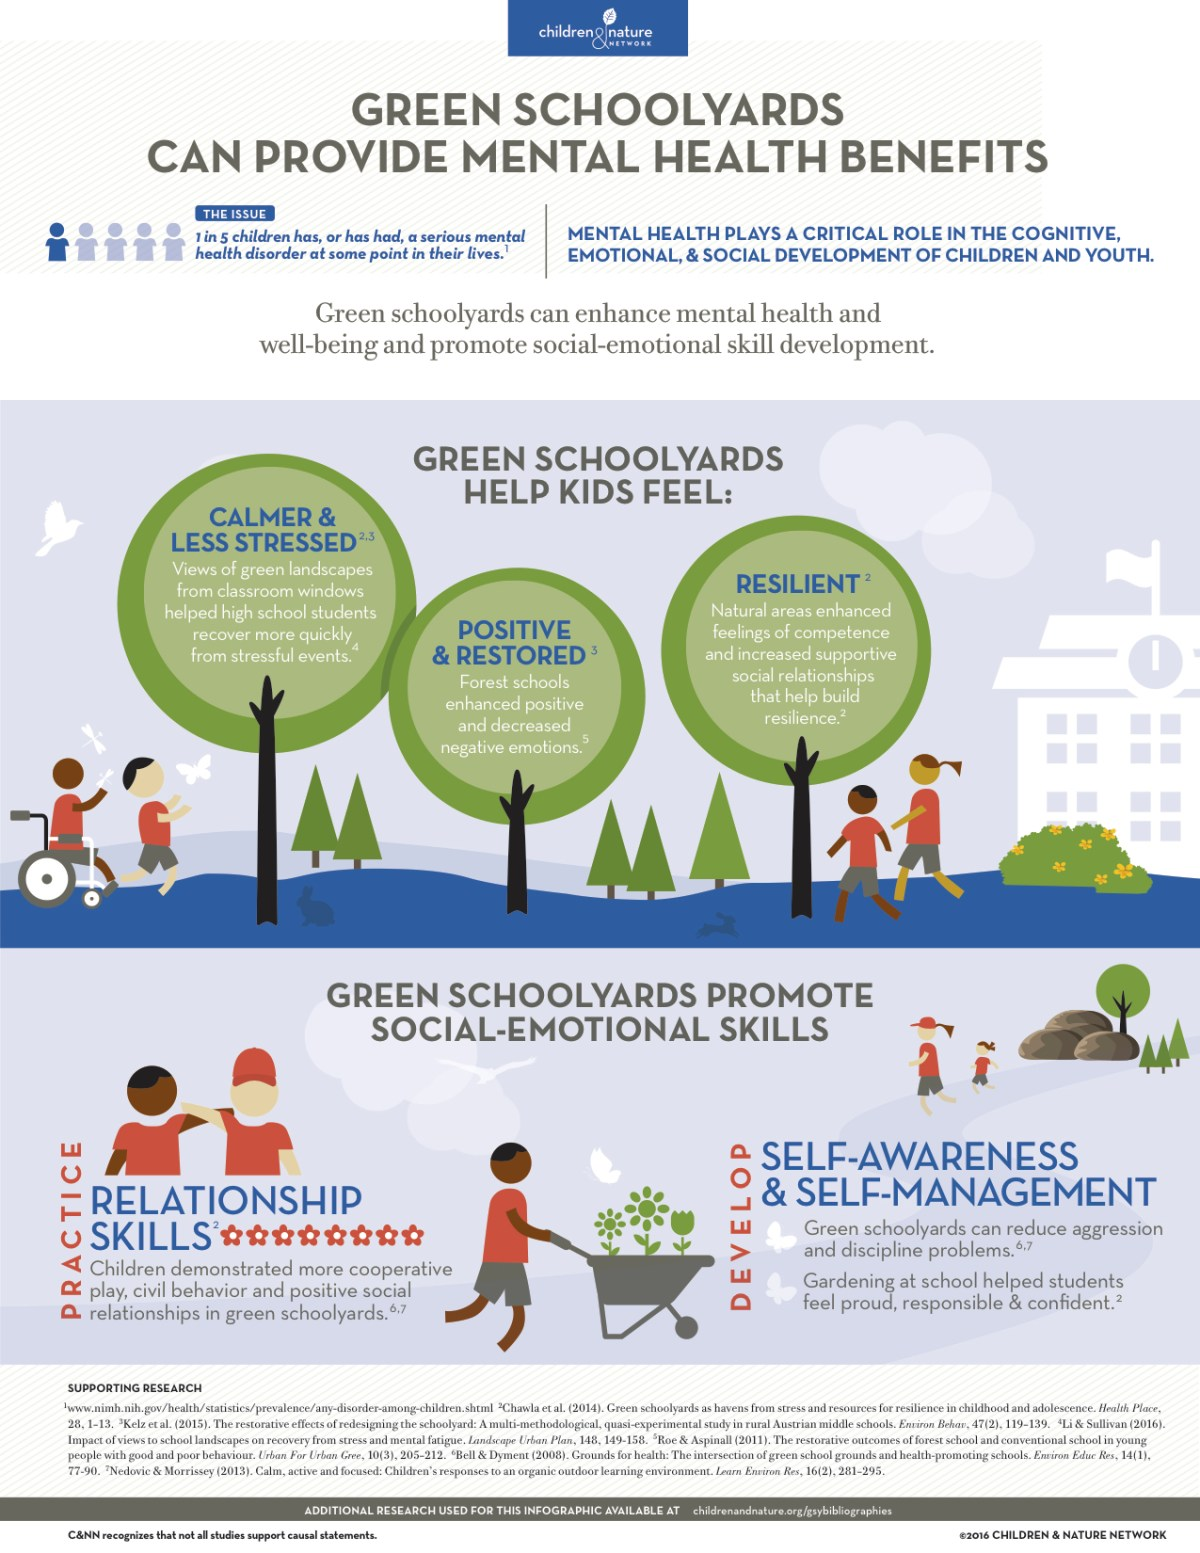 Green Schoolyards and Mental Health Benefits